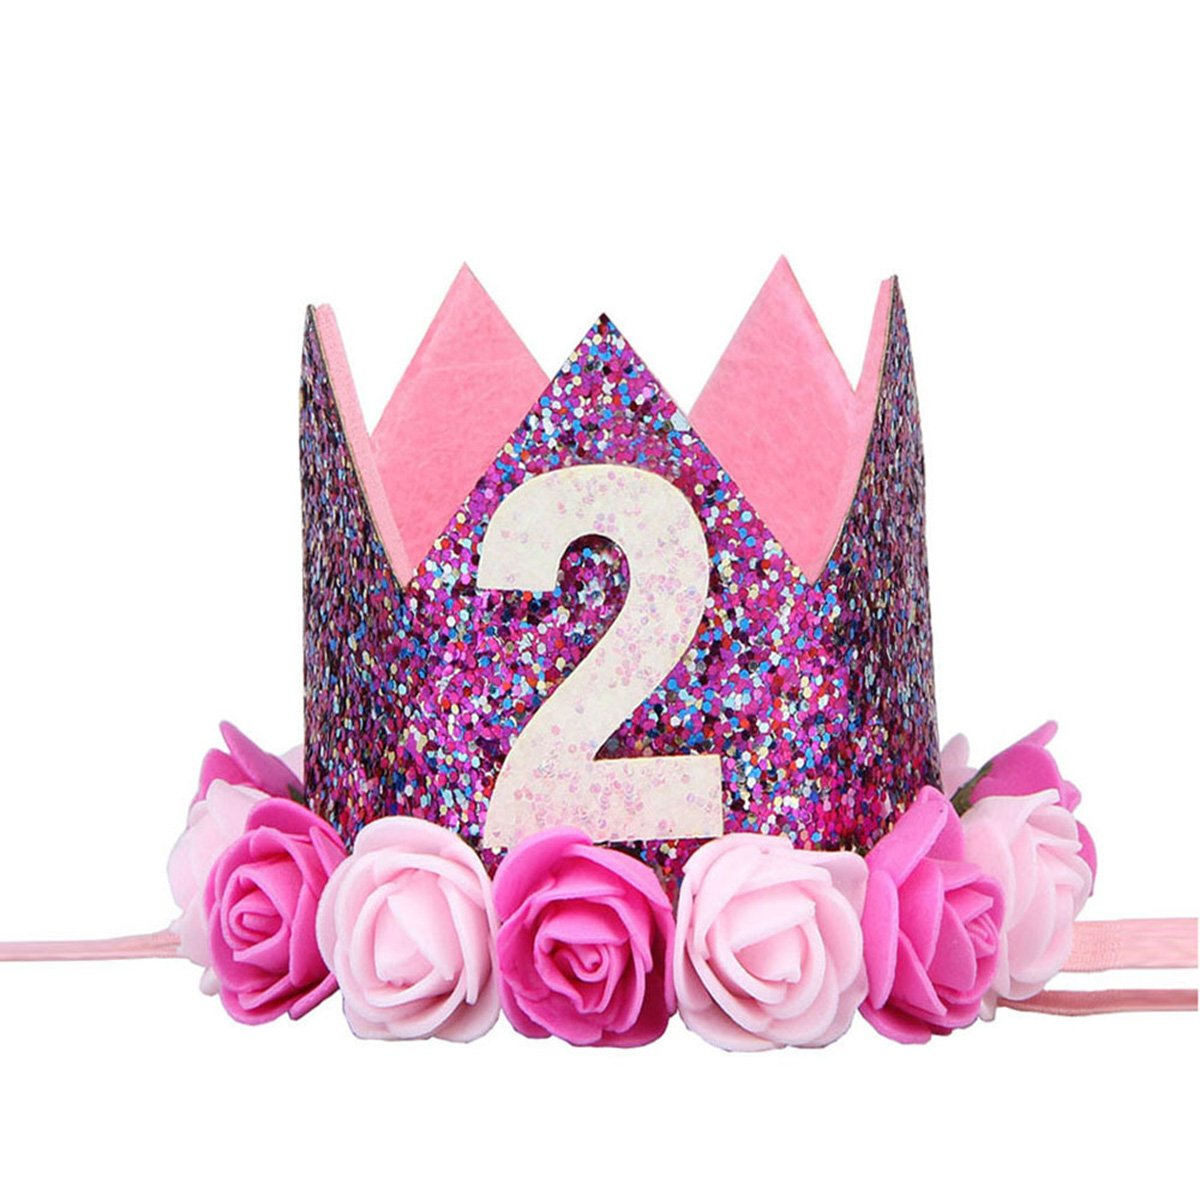 BESTOYARD Baby Second Birthday Crown Headband 2nd Princess Flower Crown Tiara Hair Hoop for Baby Birthday Party Supplies - Size 6 (2 Years Old)